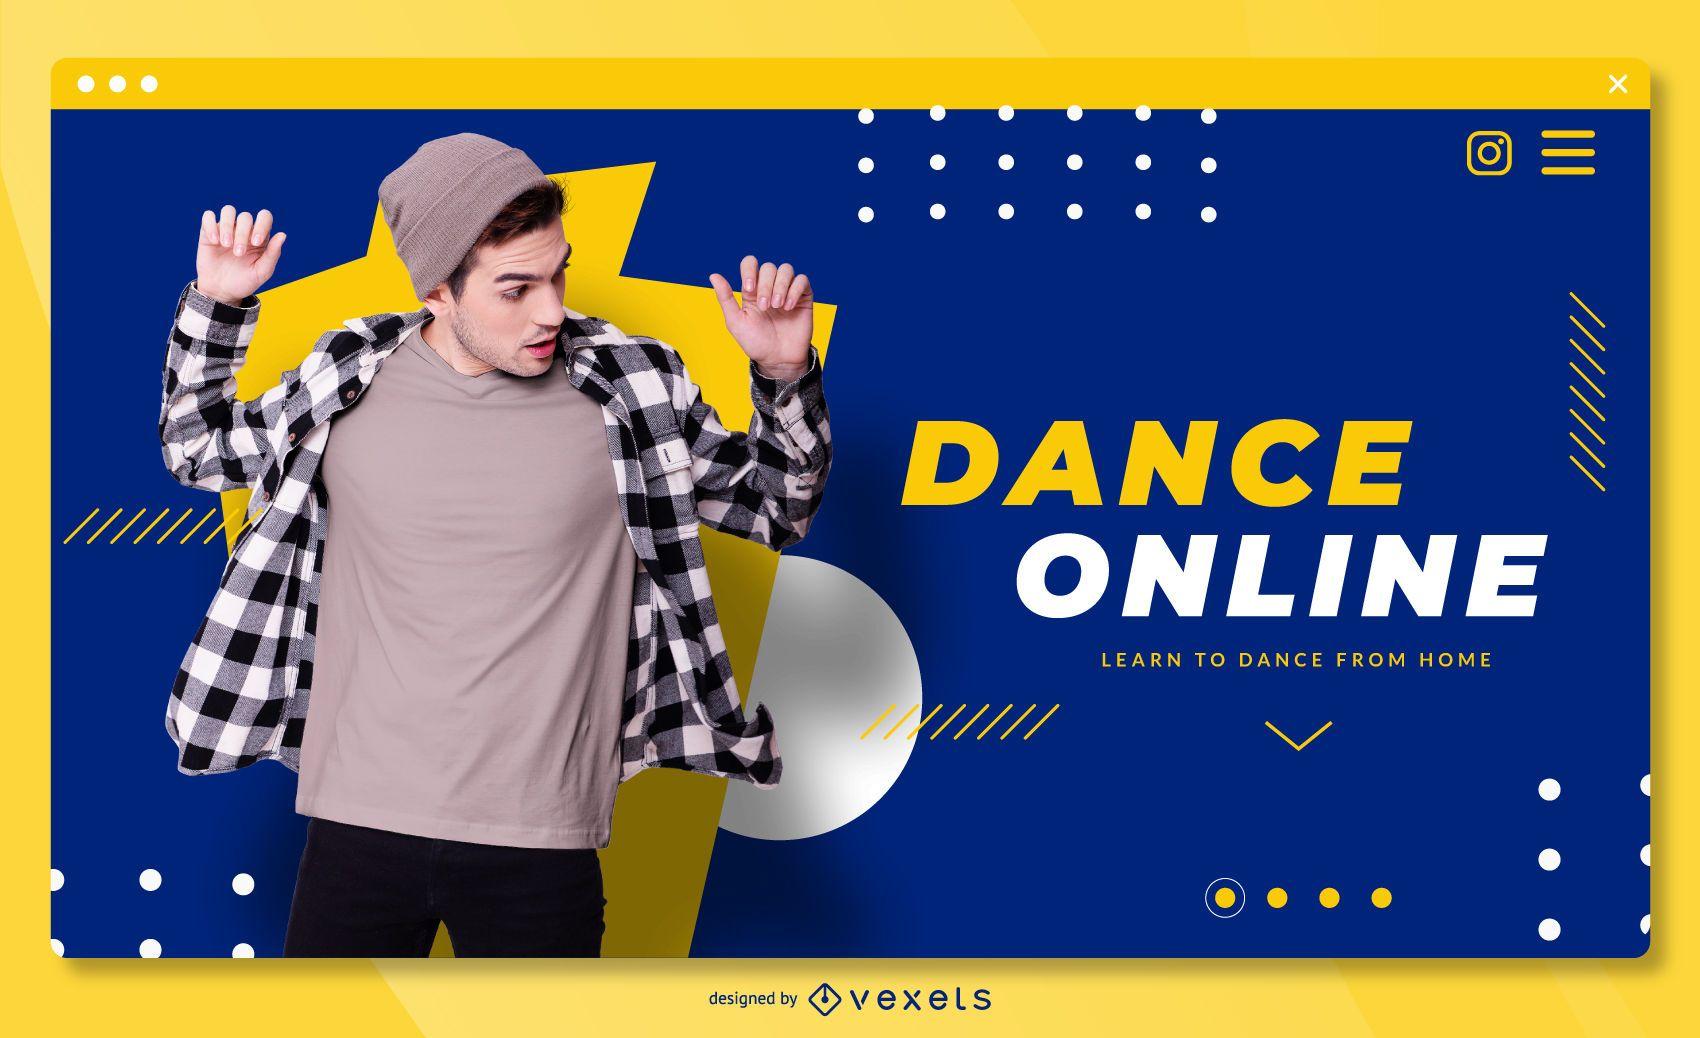 Dance online landing page template